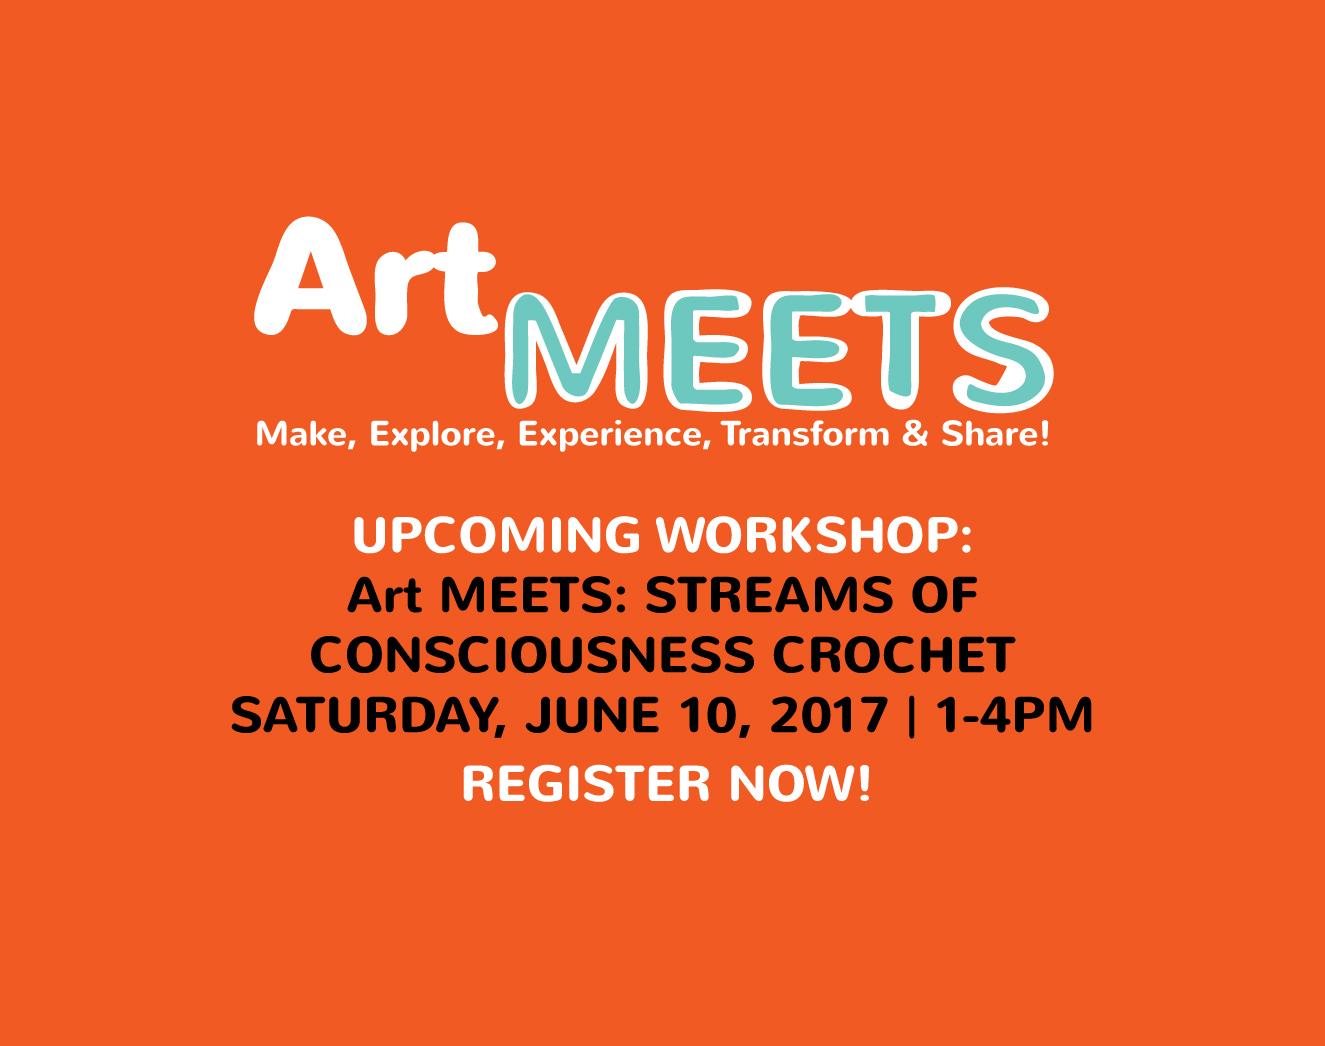 Art MEETS: Streams Of Consciousness Crochet